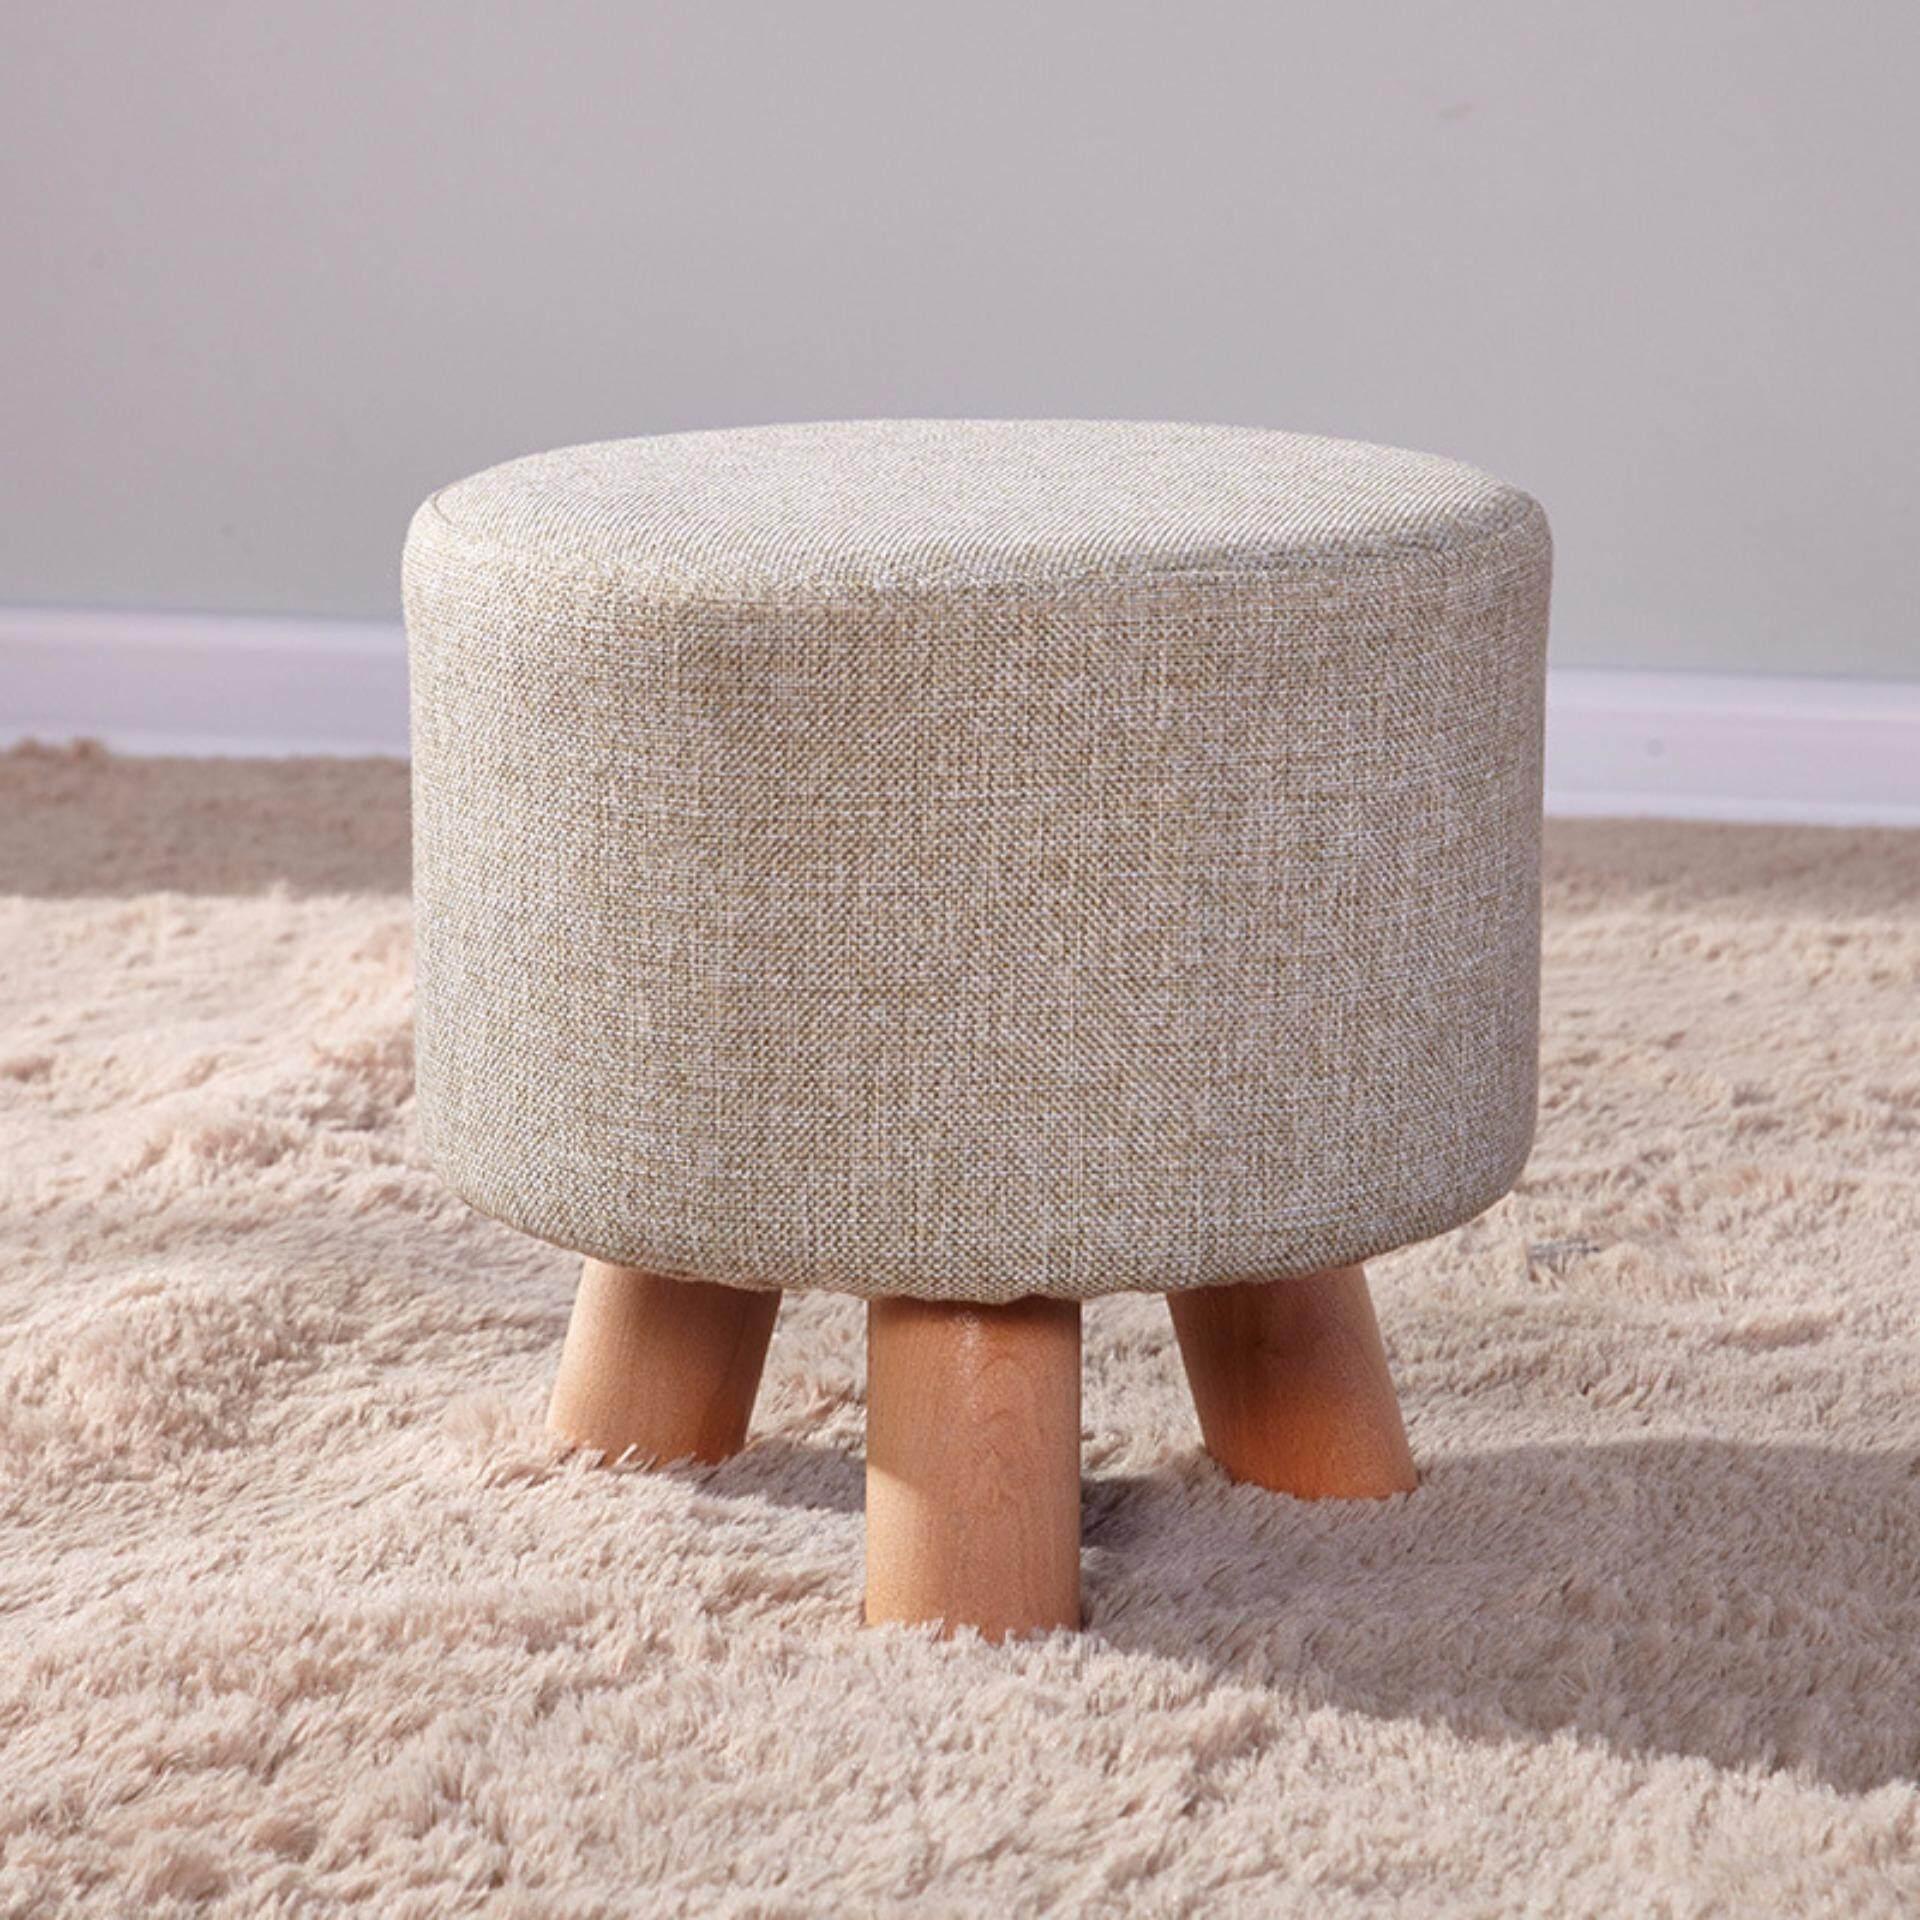 Solid wood Fashion Shoe Stool Child Sofa Short Stool 28 * 25cm - intl